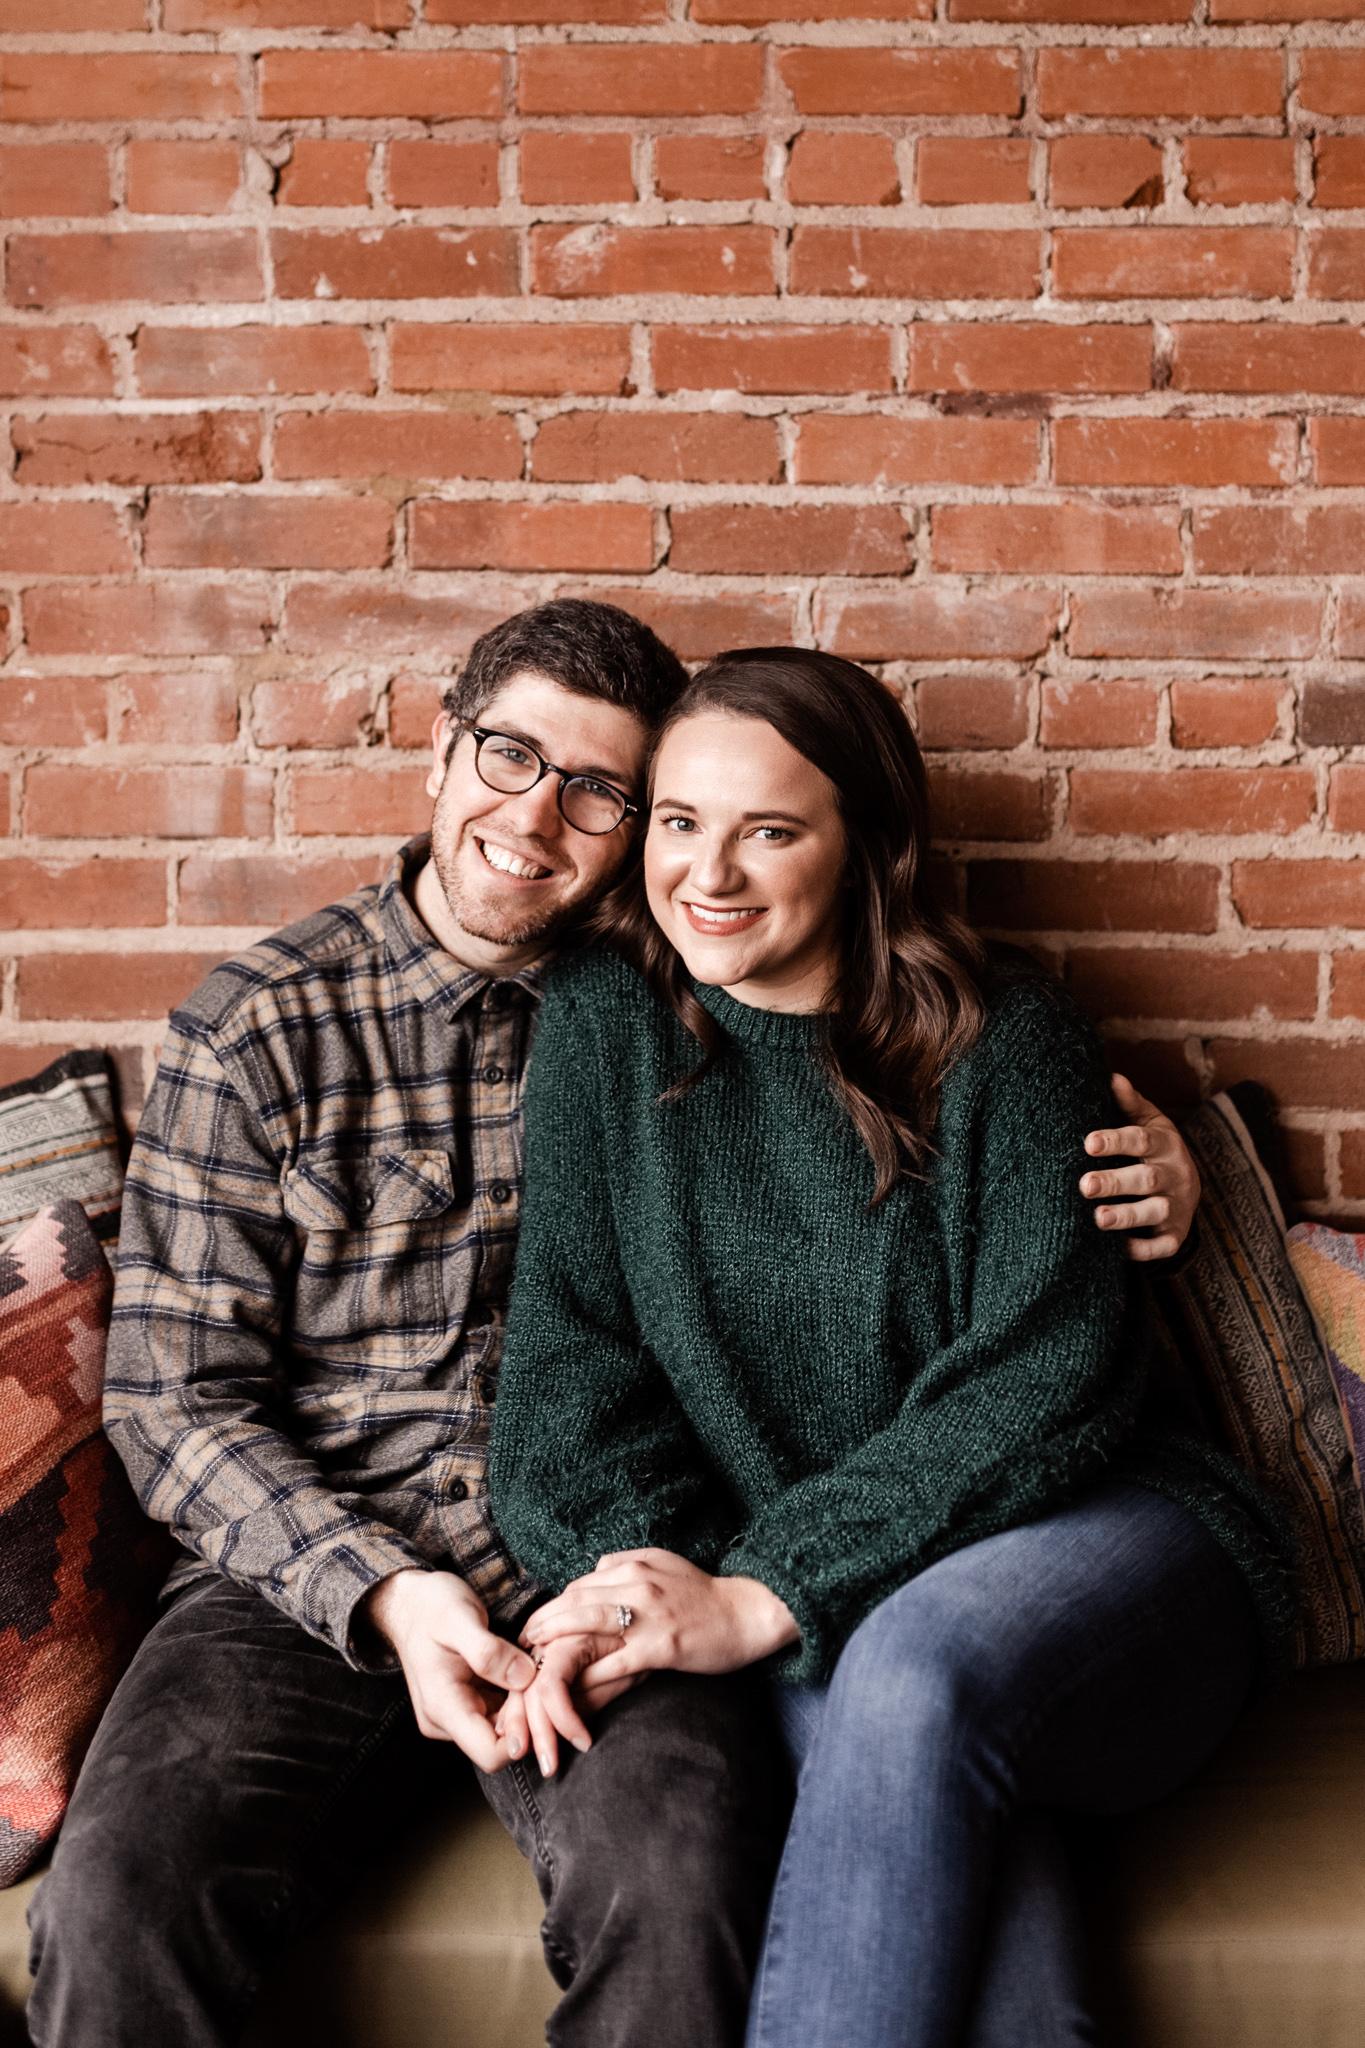 Seamus + Lauren | Modern Downtown Engagements | Oklahoma Wedding Photographer-3.jpg